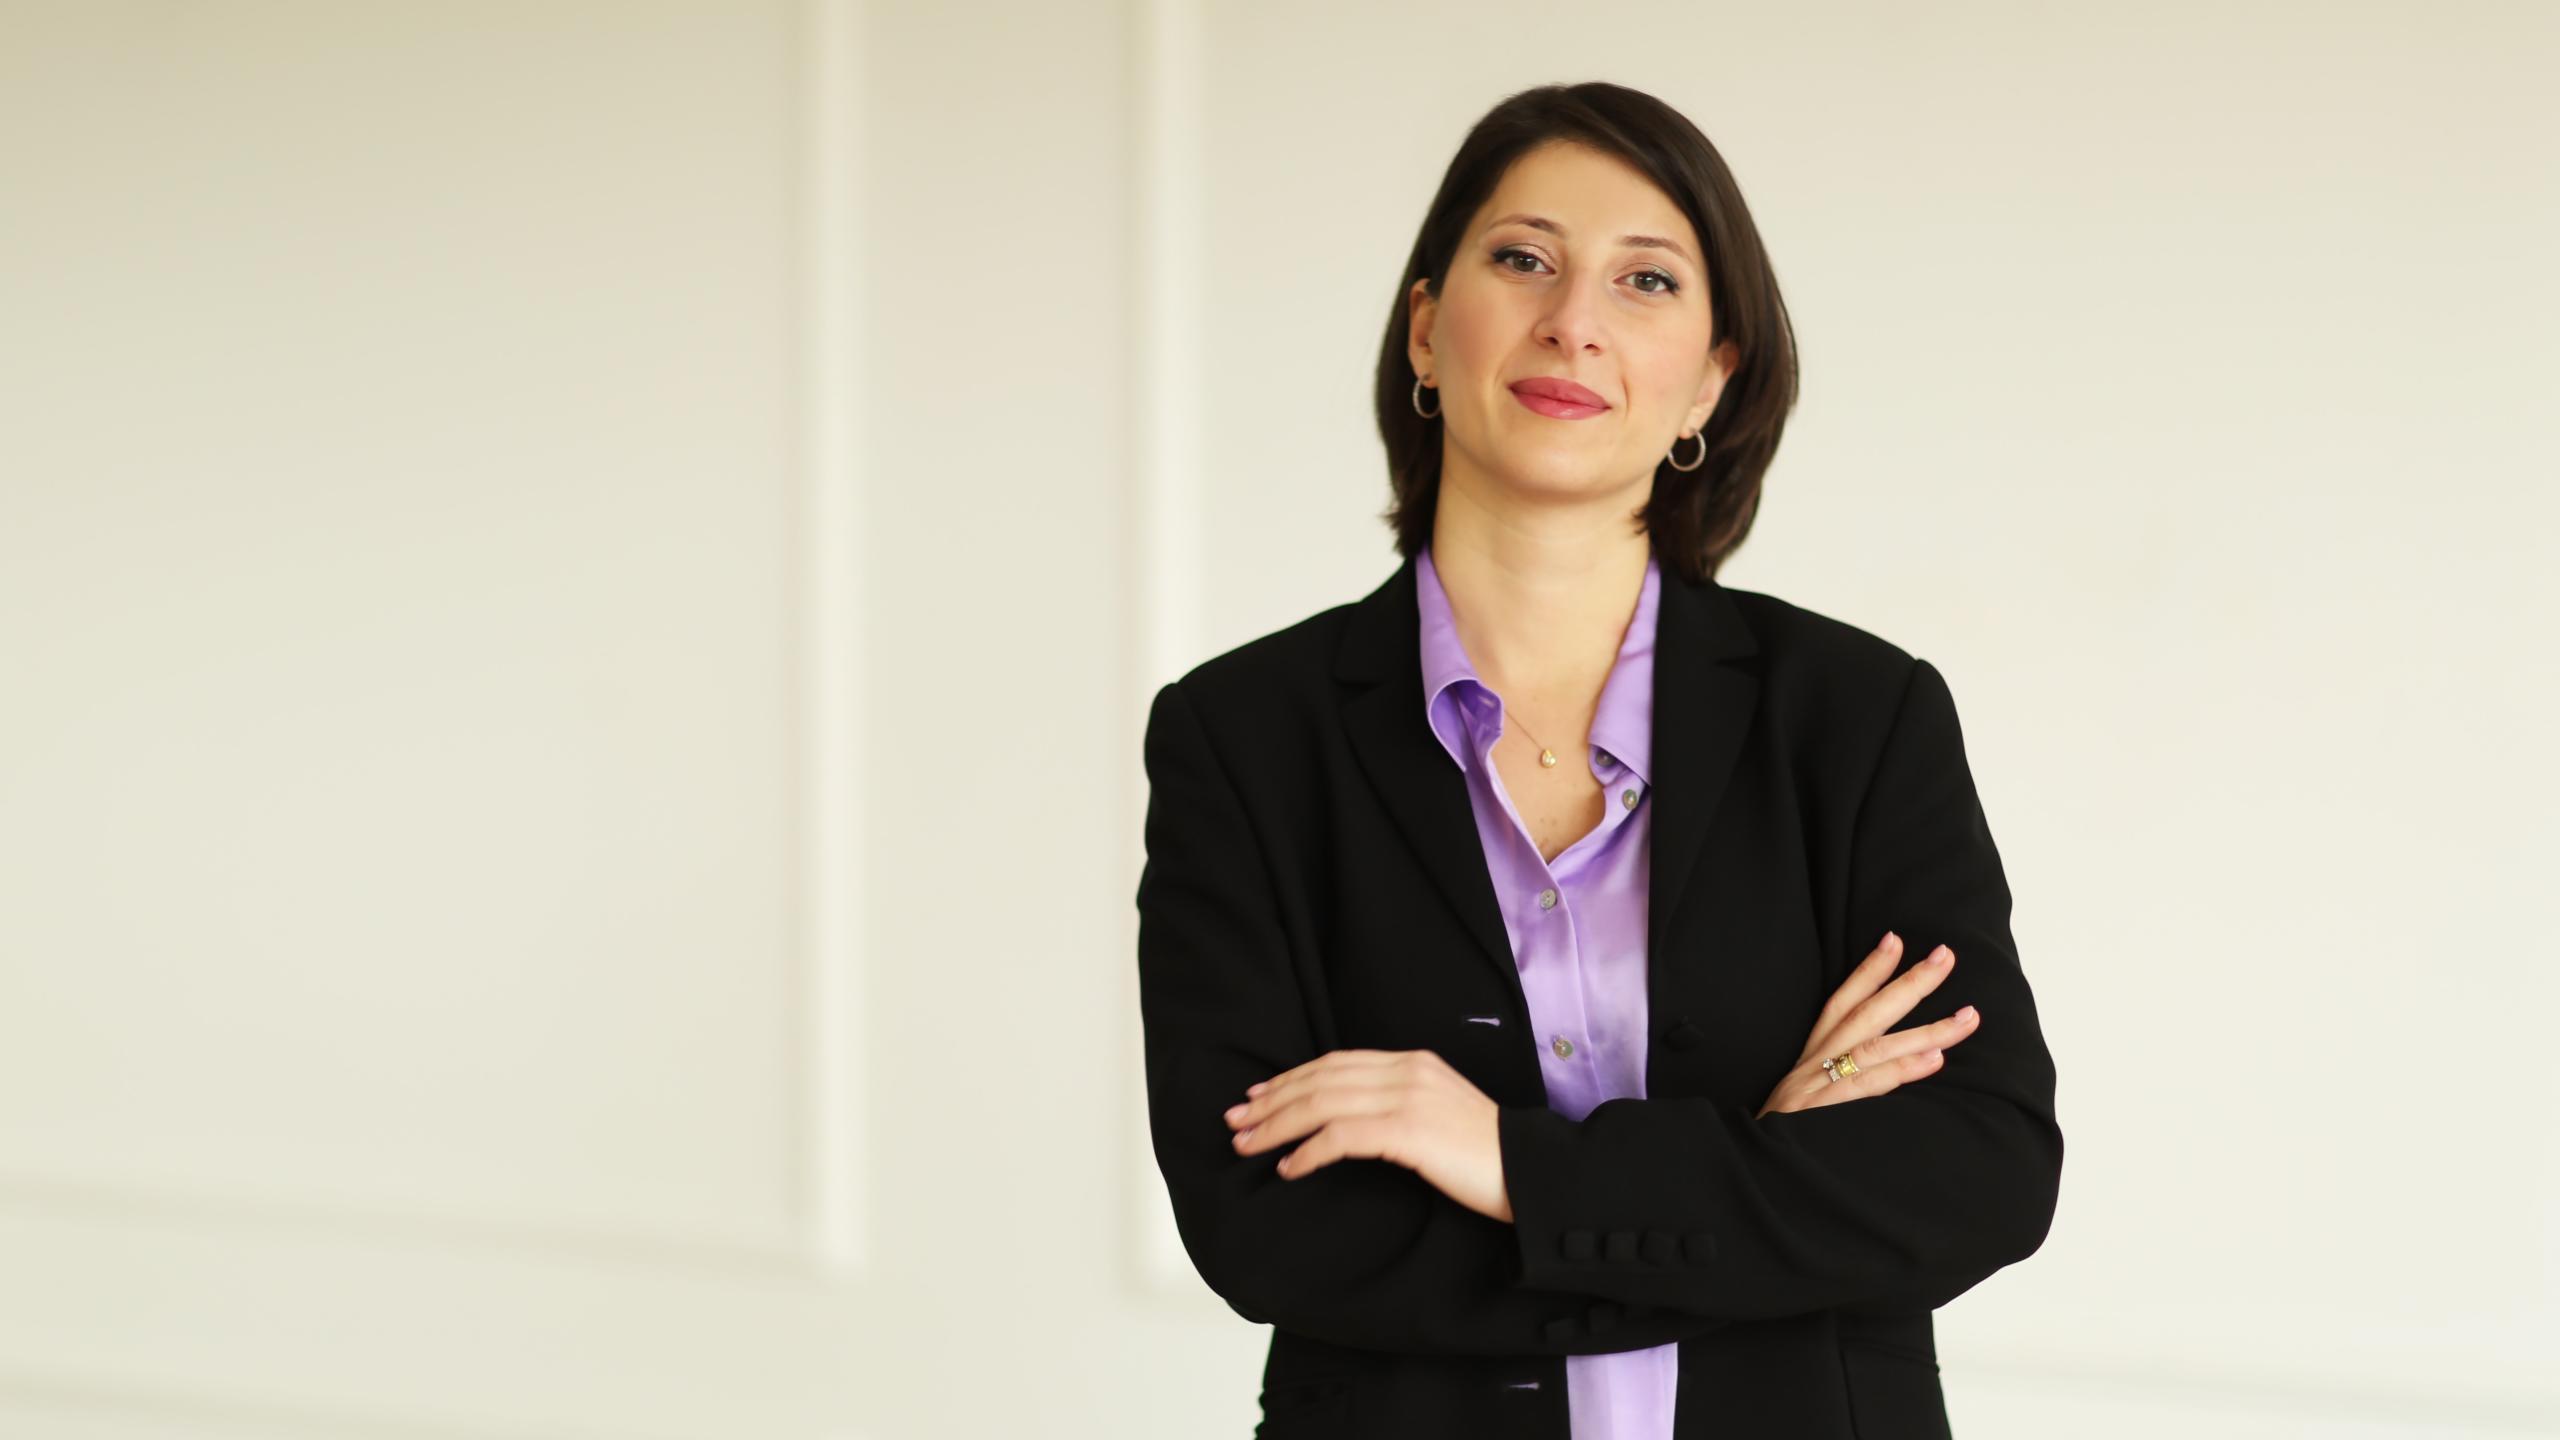 Lika Kartozia, MBA IHM Class of 2022